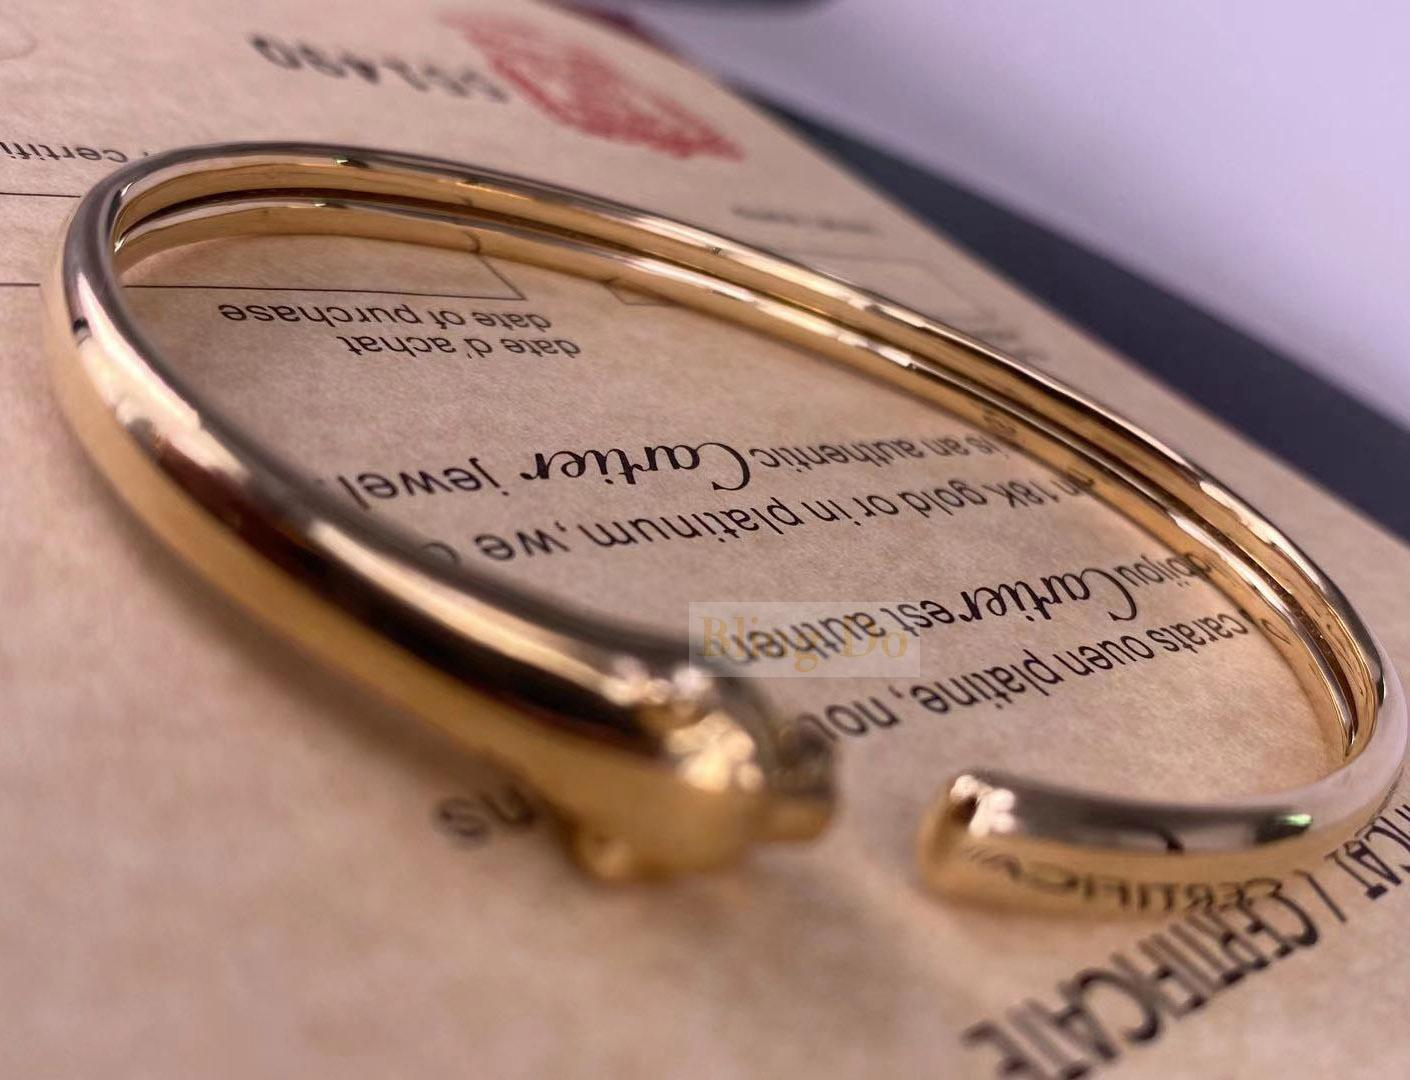 Panthère De Cartier 18K Yellow Gold Bracelet with Onyx and Tsavorite Garnets